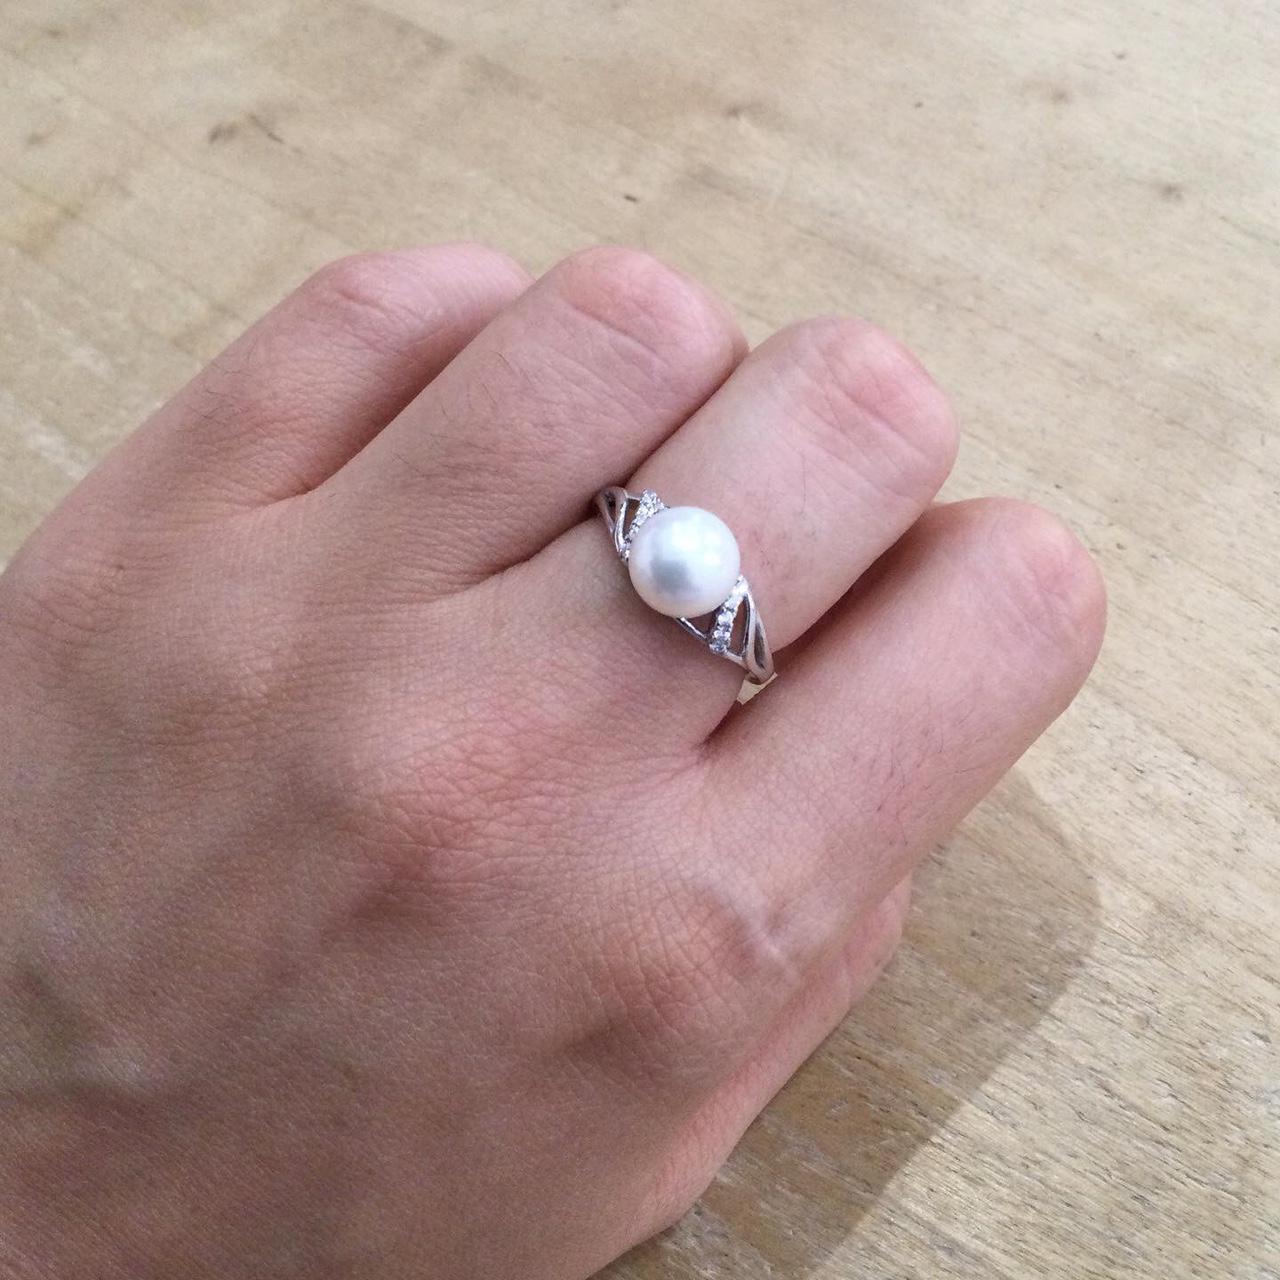 Product Image 1 - Anello regolabile in argento 925